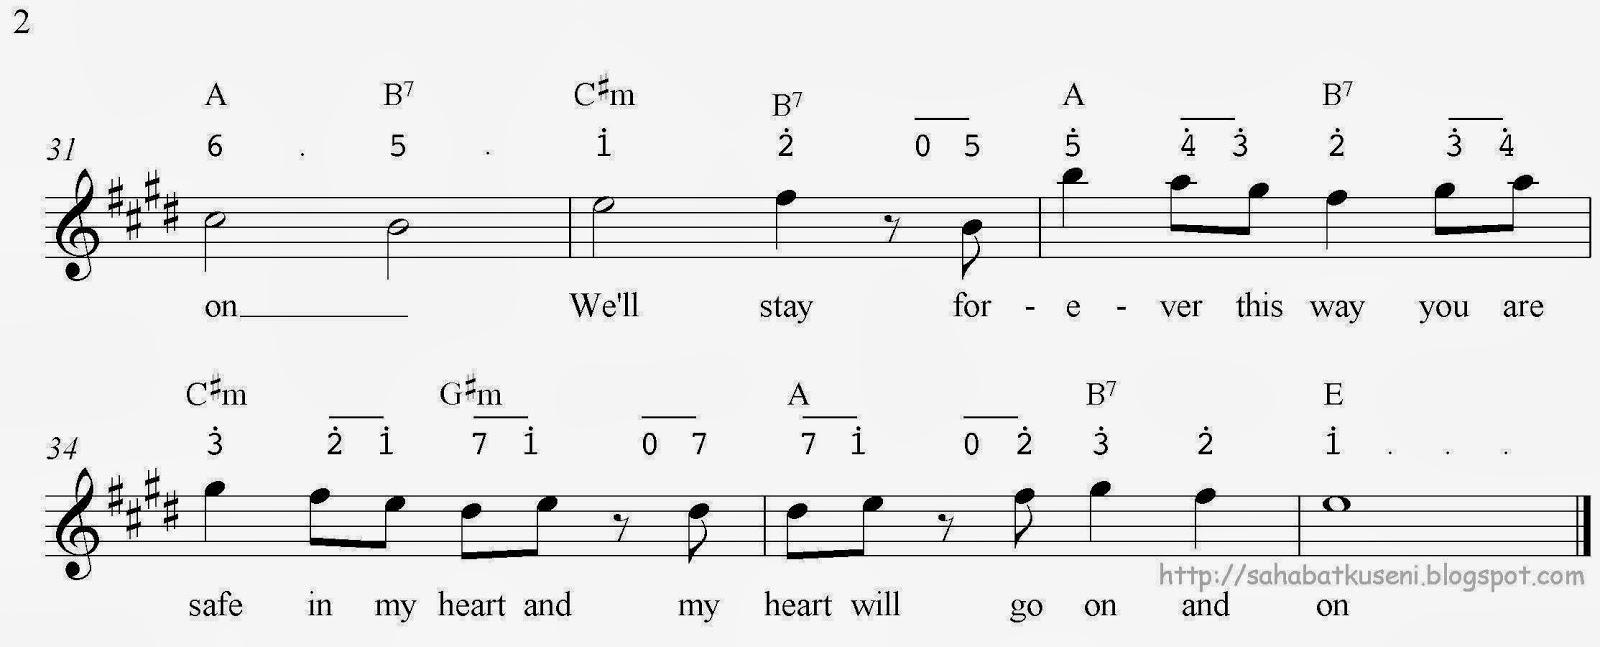 Not Balok, Not Angka, juga Lirik Chord My Heart Will Go On